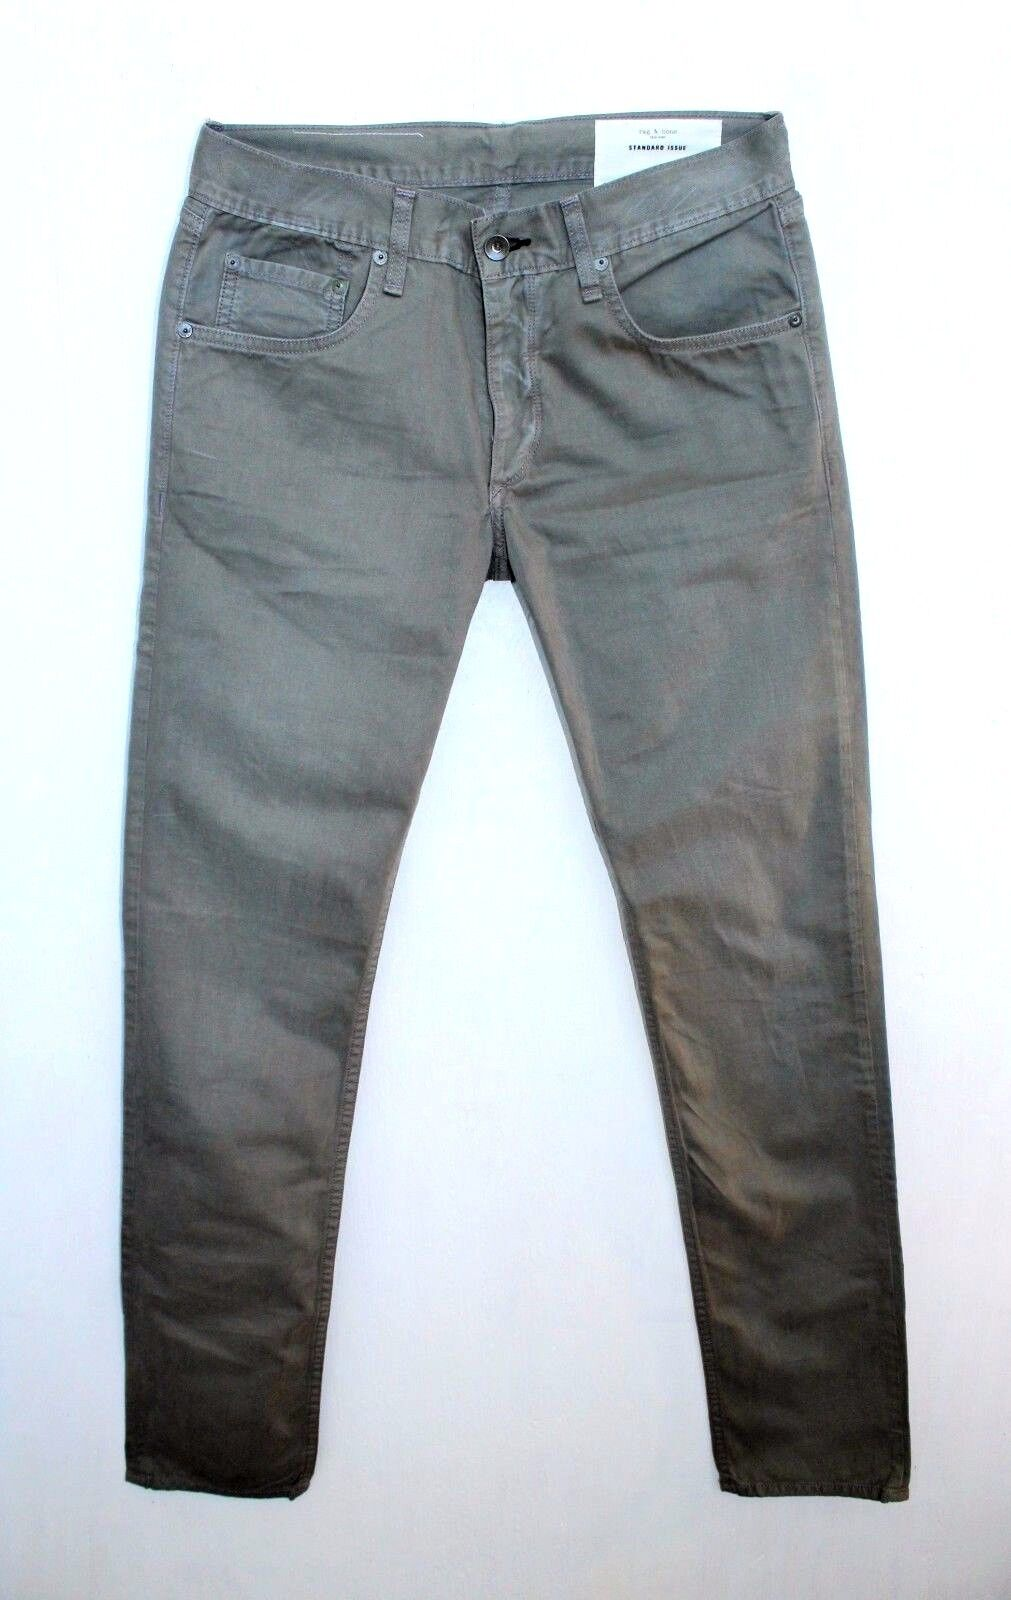 Men's Rag & Bone tapered Fit 2, distressed grey, pants, jeans, s. 29, 30